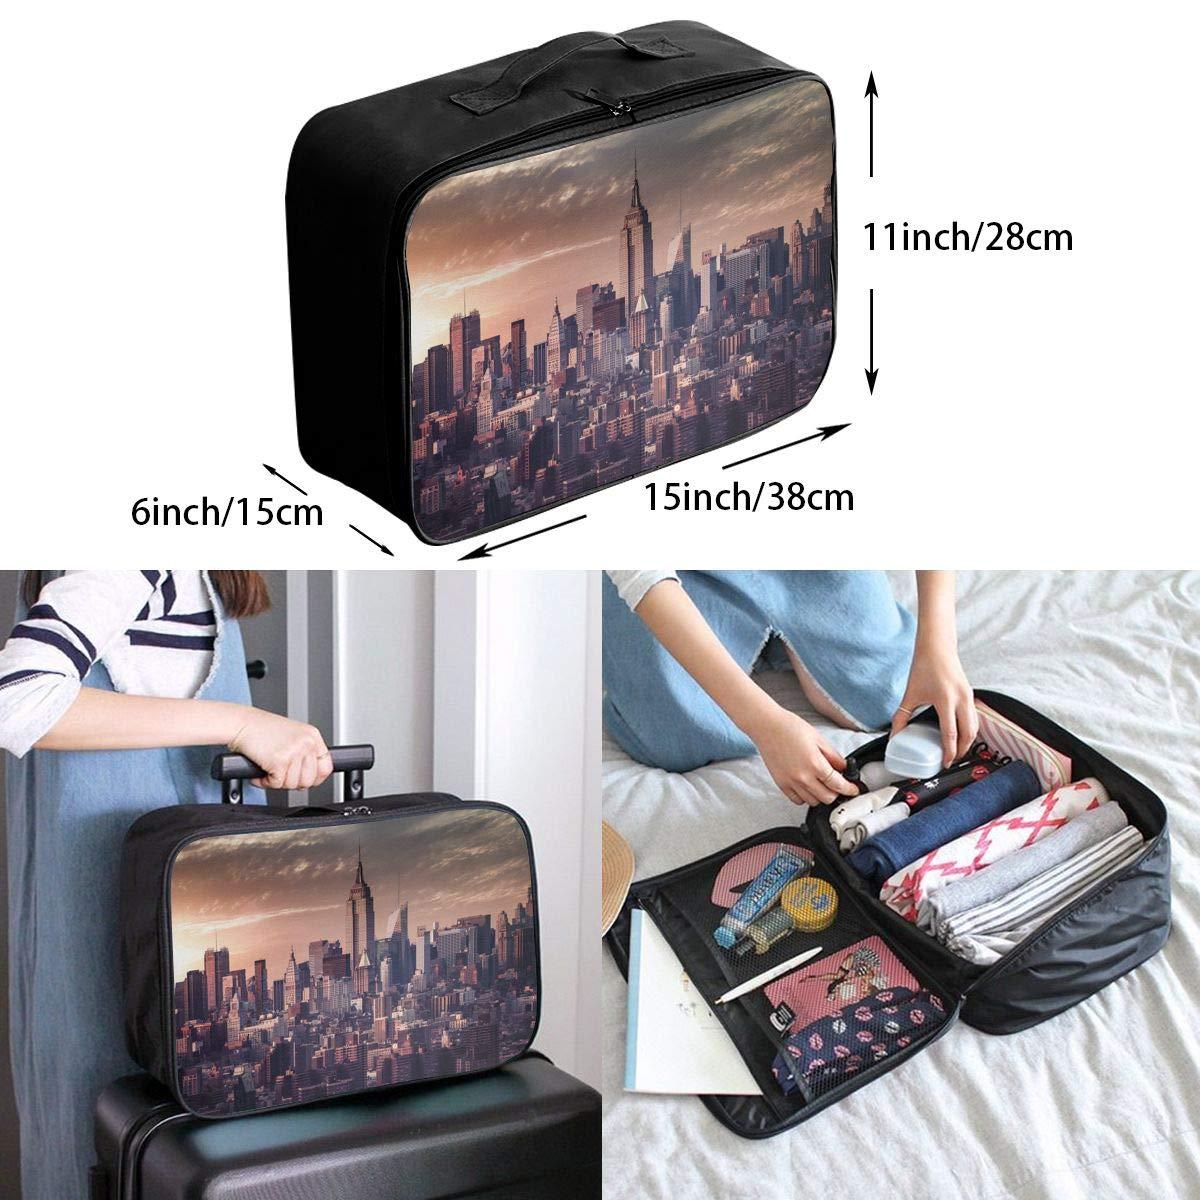 Travel Luggage Duffle Bag Lightweight Portable Handbag I Love Painting Large Capacity Waterproof Foldable Storage Tote